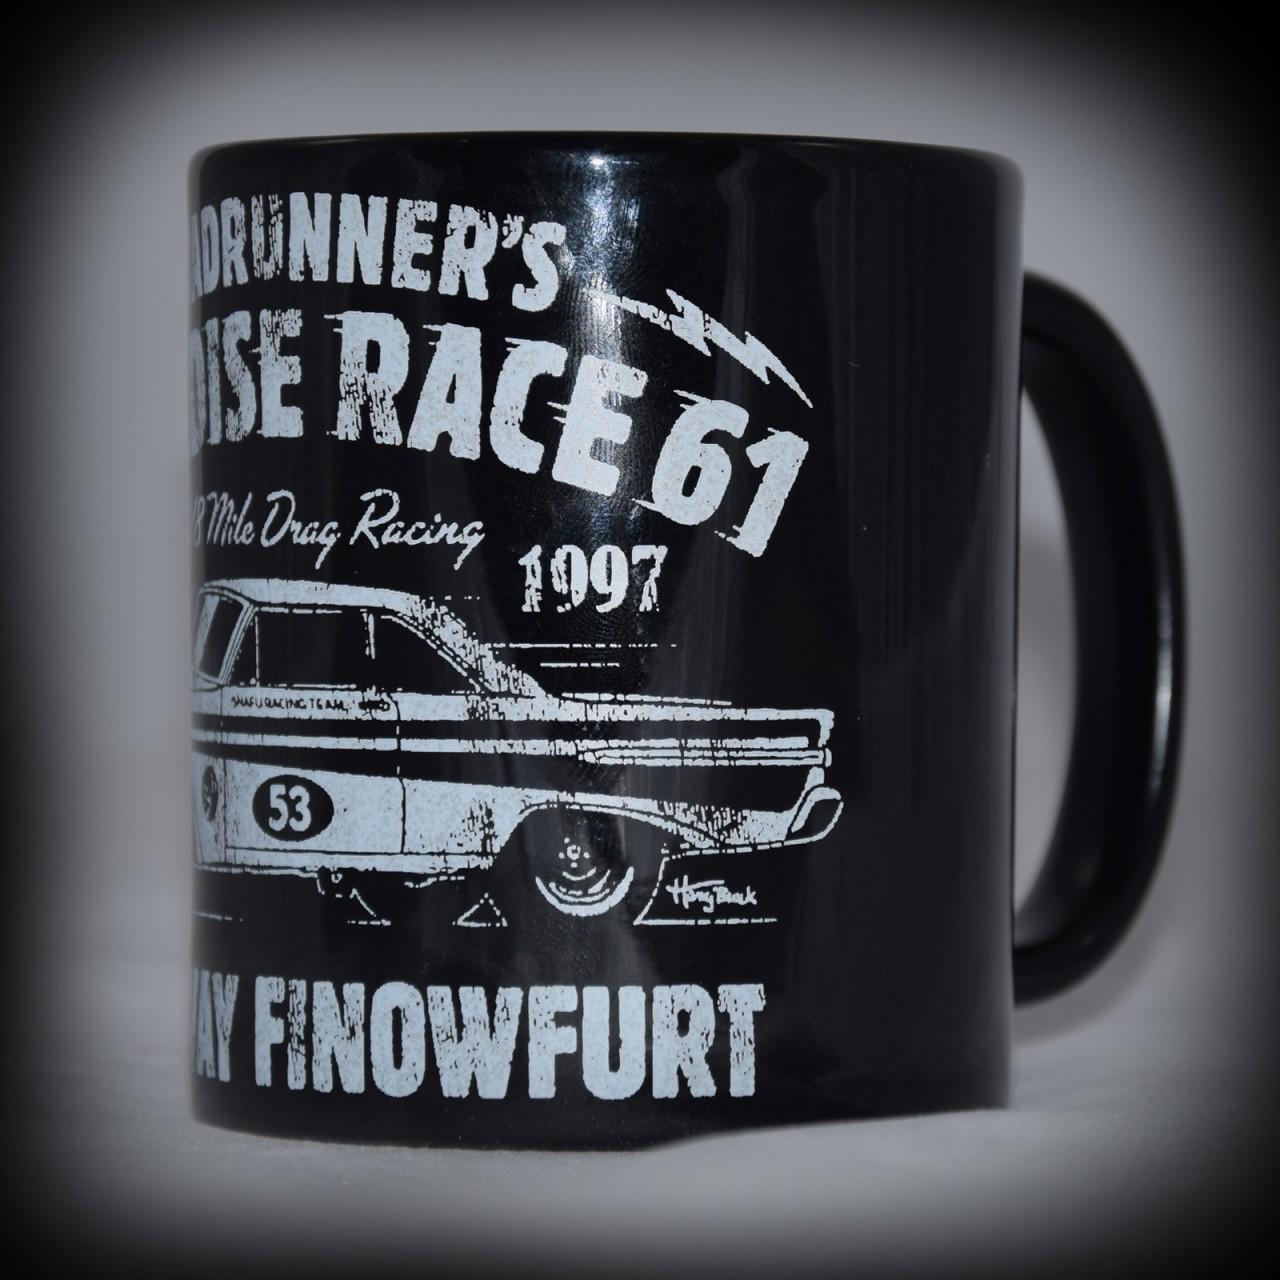 Race 61 Keramiktassen 1/8 Mile Drag Racing 53